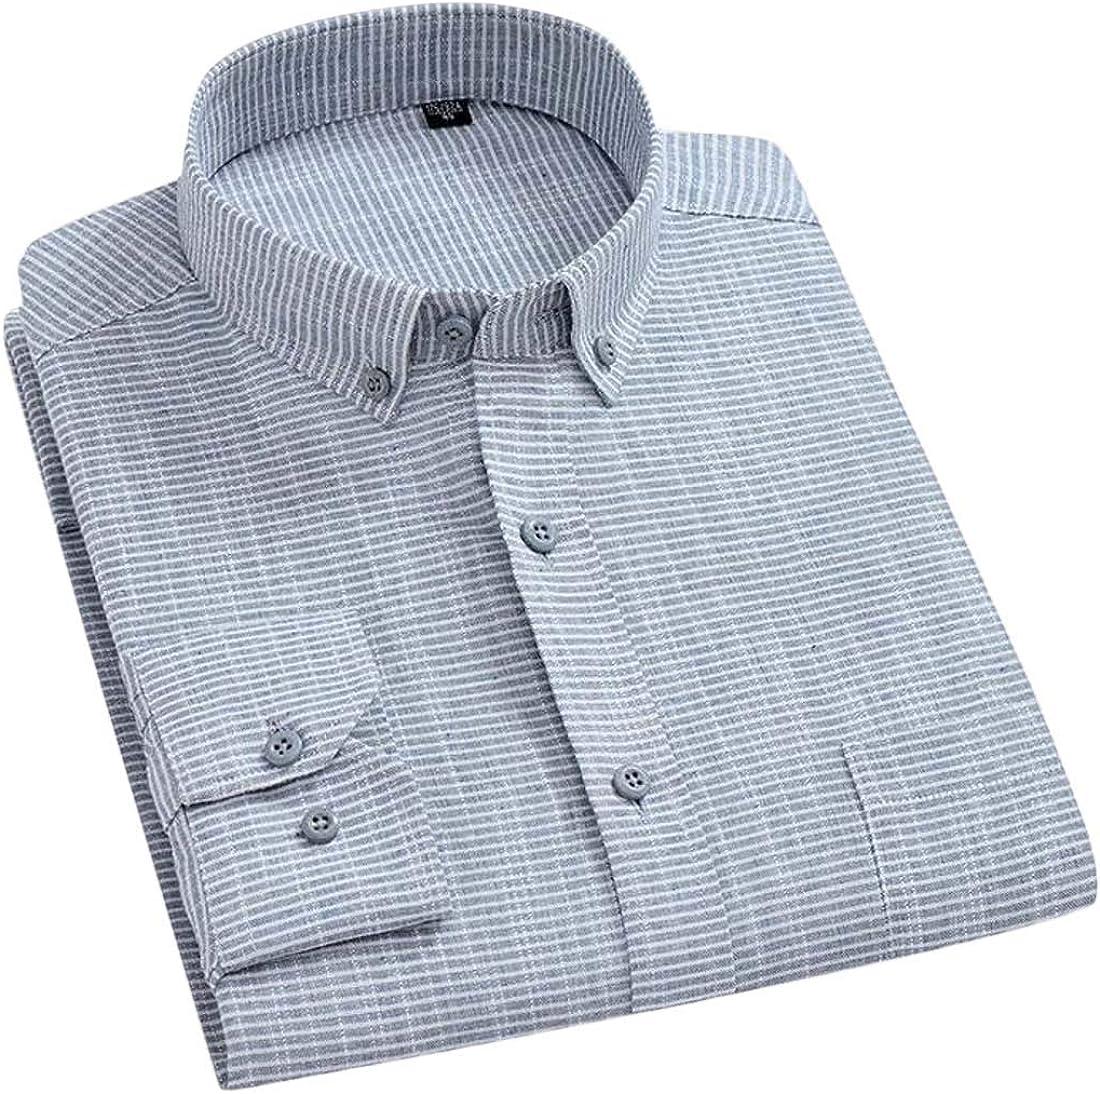 Hajotrawa Mens Casual Plaid Striped Long-Sleeve Regular Fit Shirt